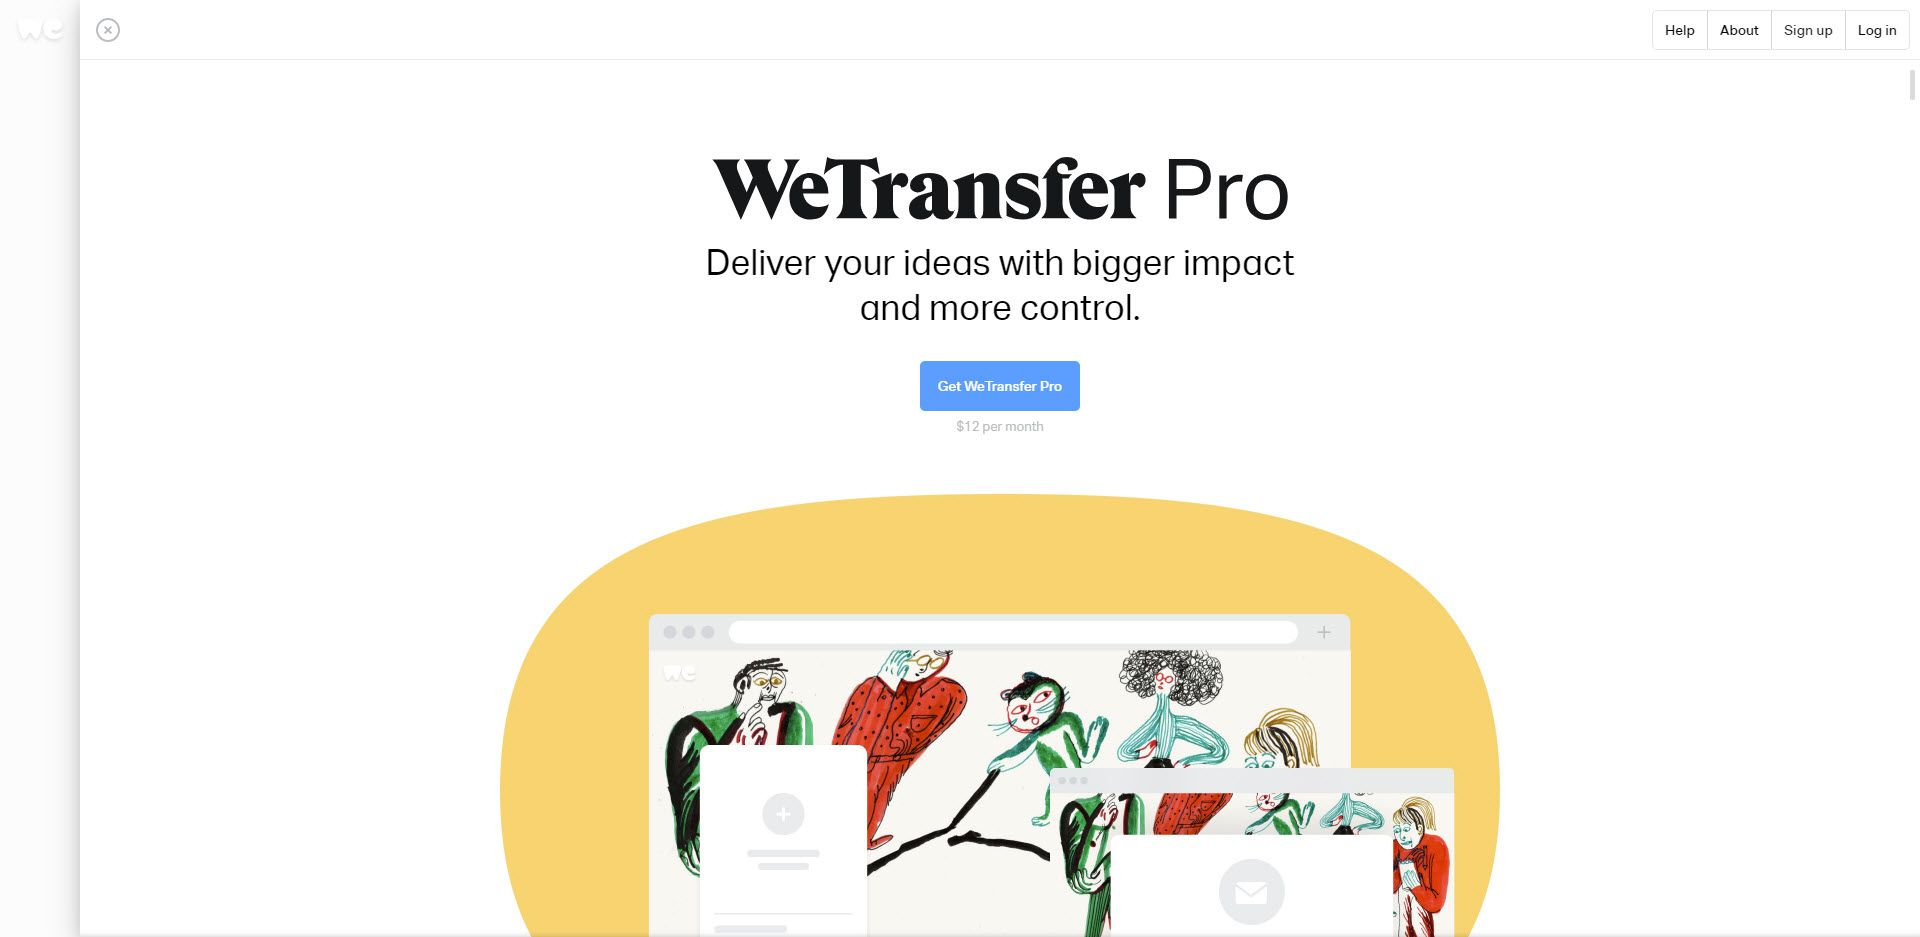 Screenshot of the WeTransfer Pro website.